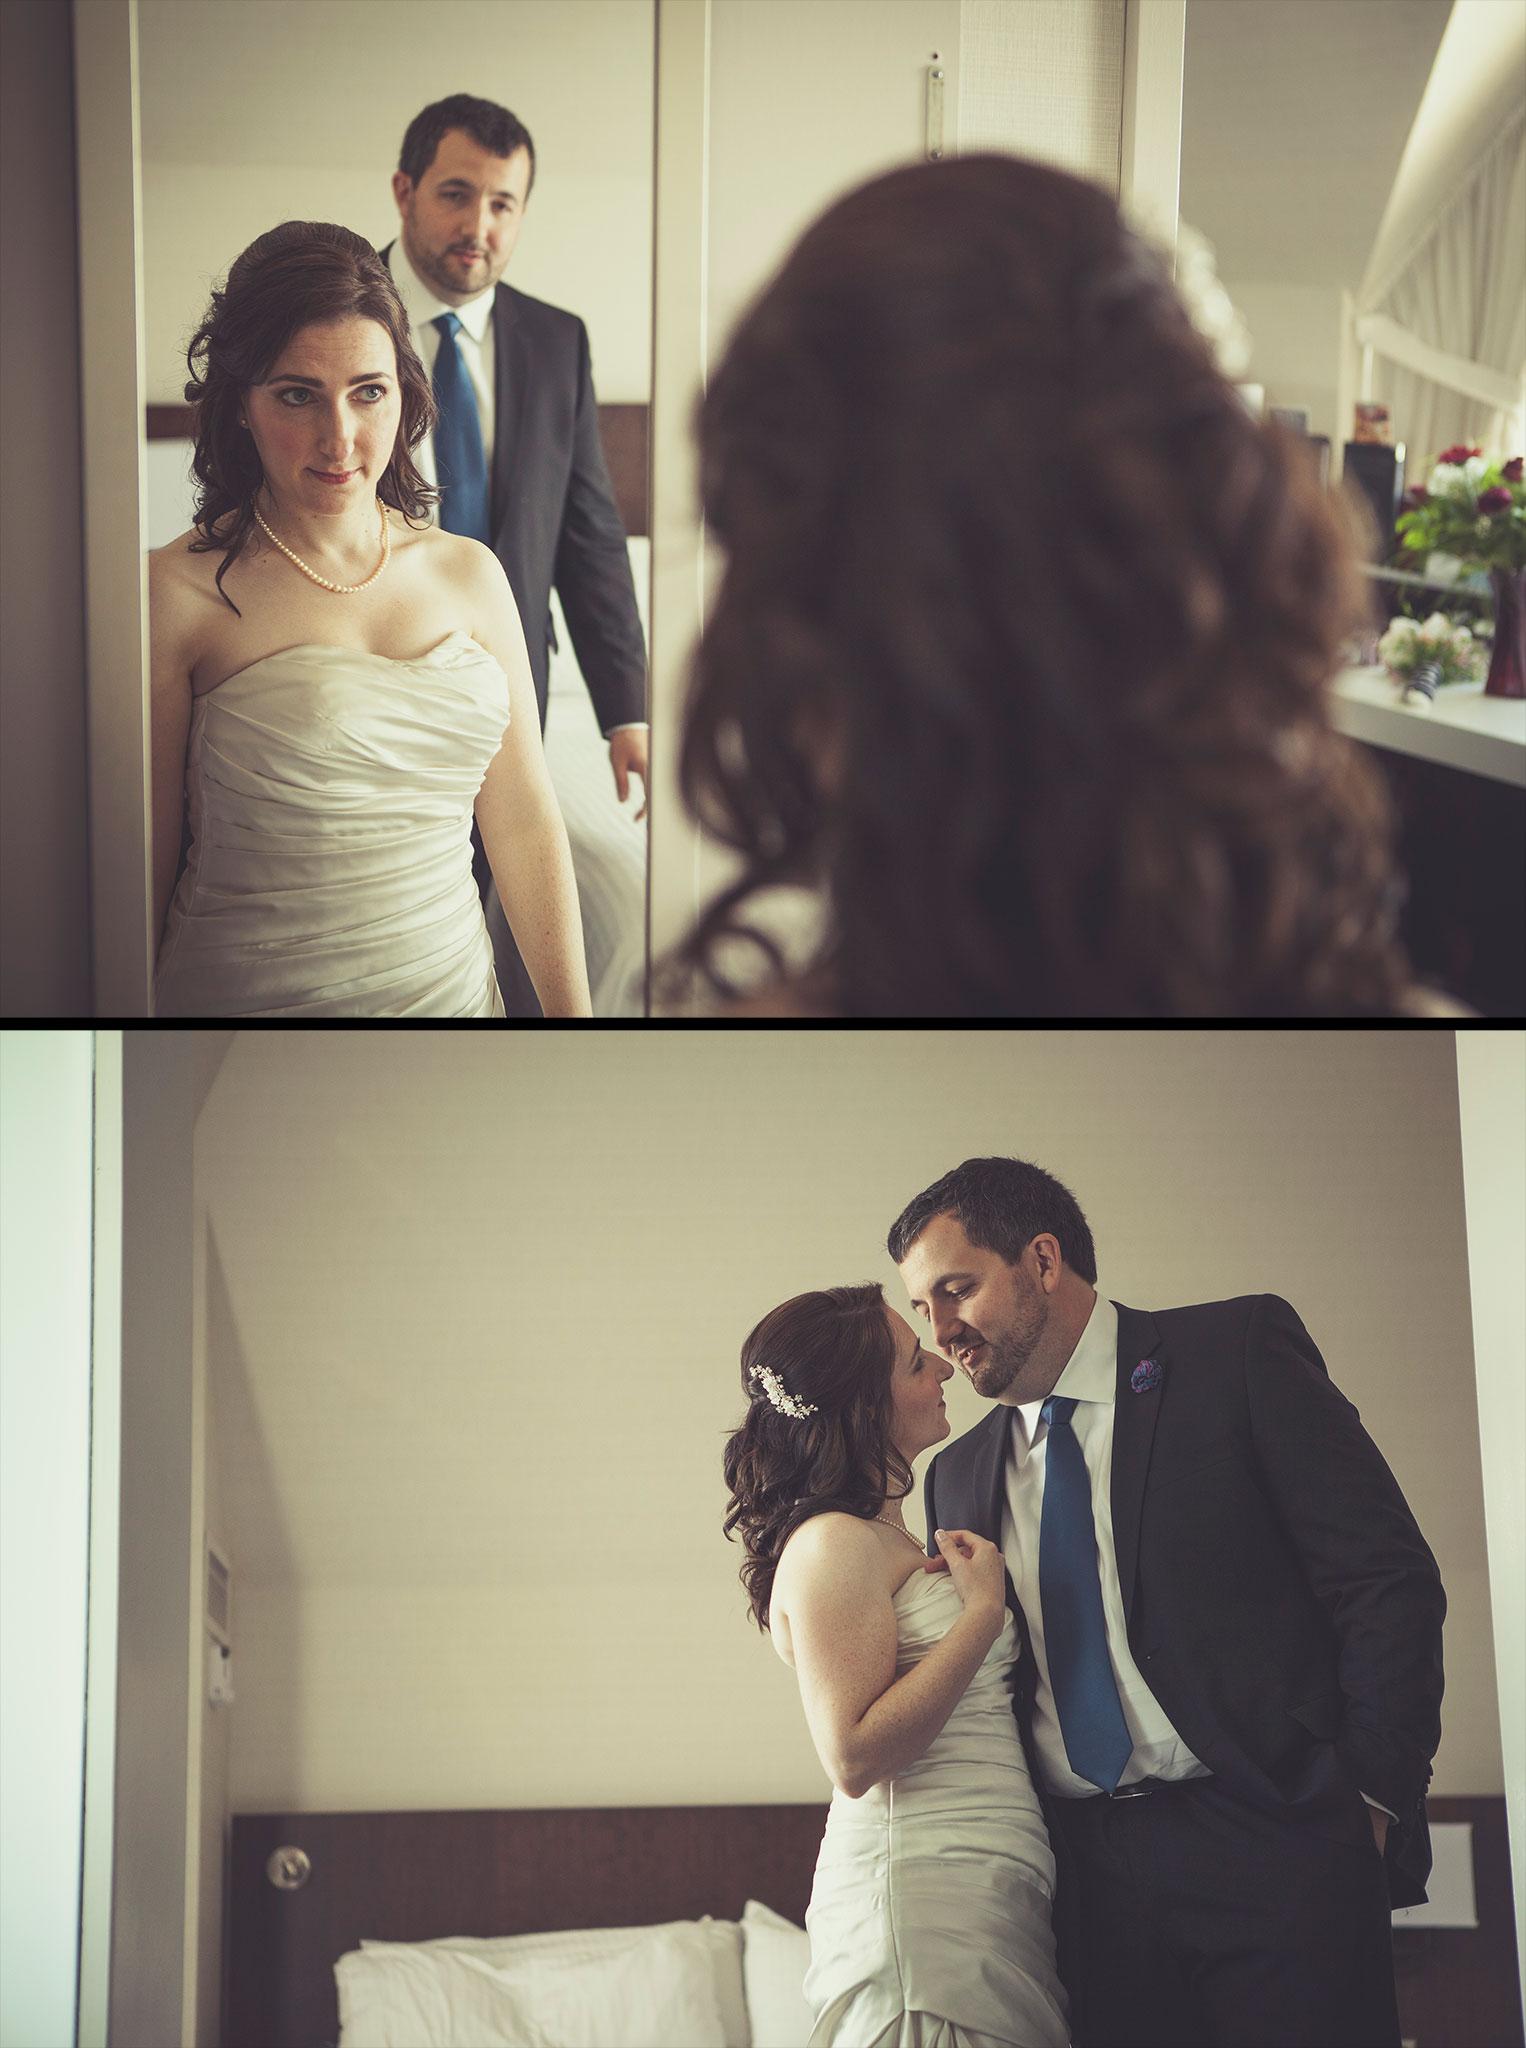 wedding-photographer-toronto-canada-shayne-gray_8014.jpg